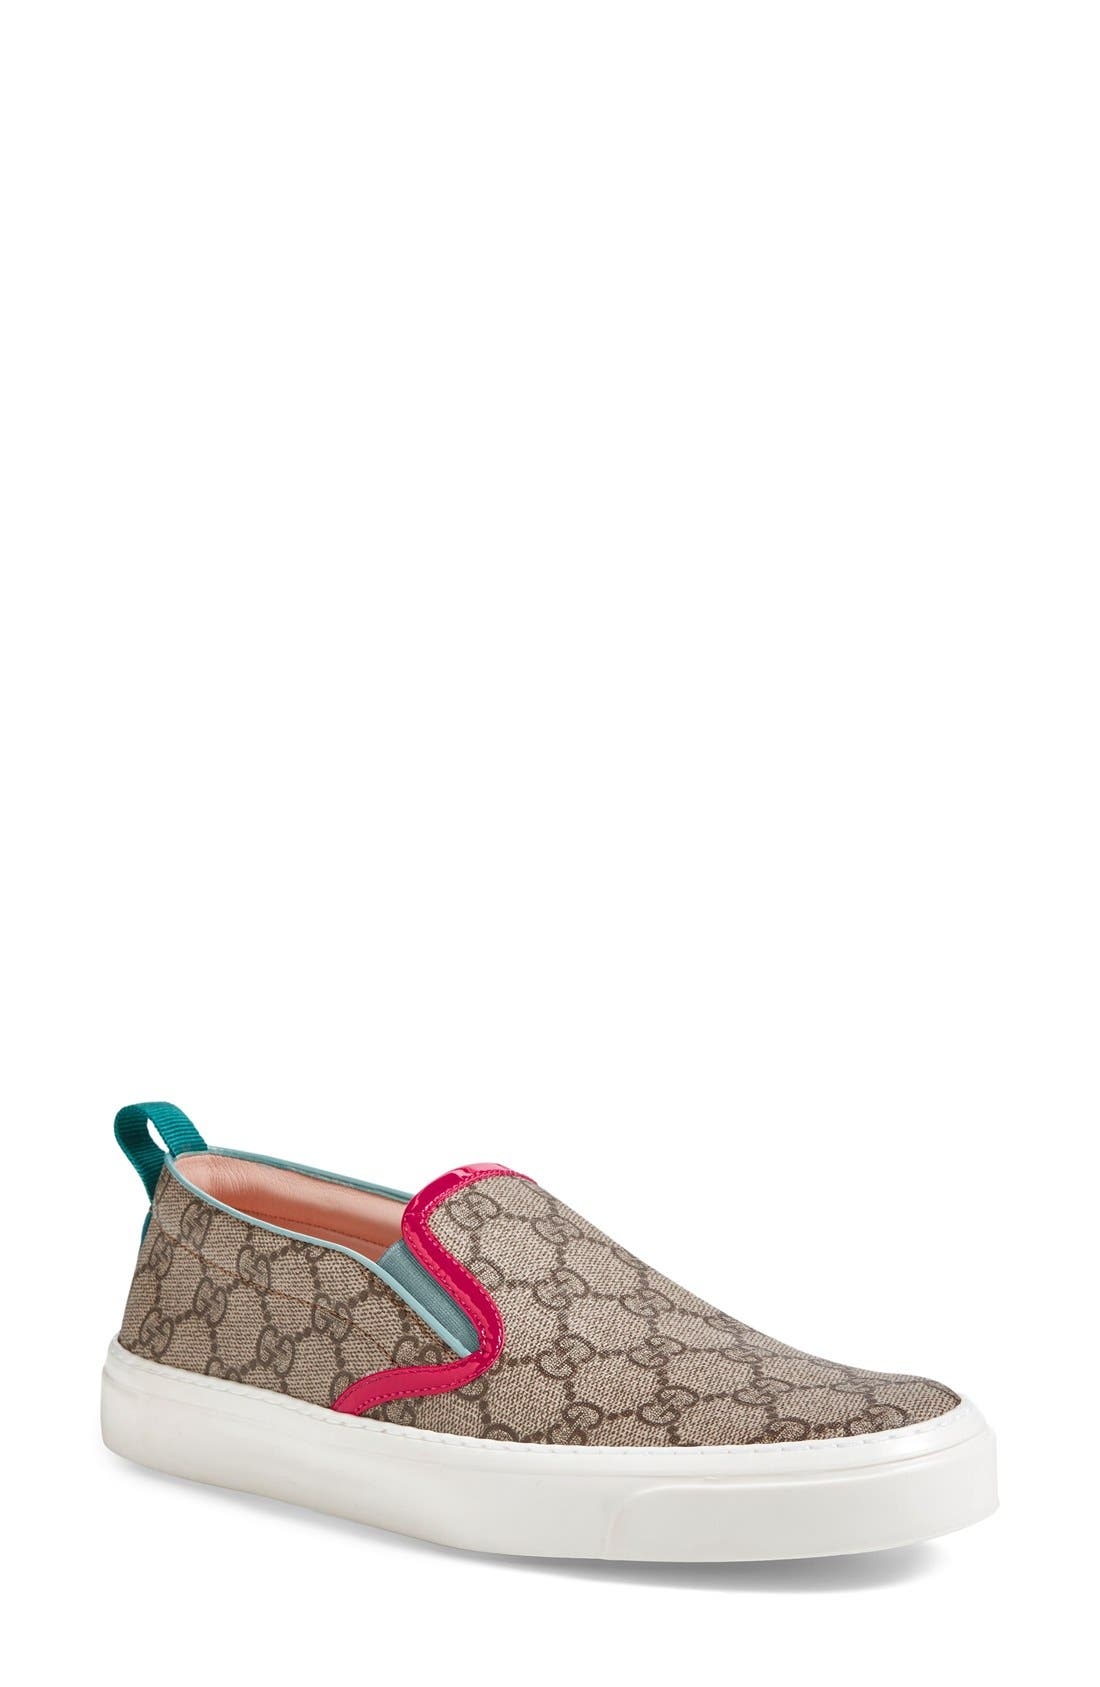 Main Image - Gucci 'Board' Skate Slip-On (Women)